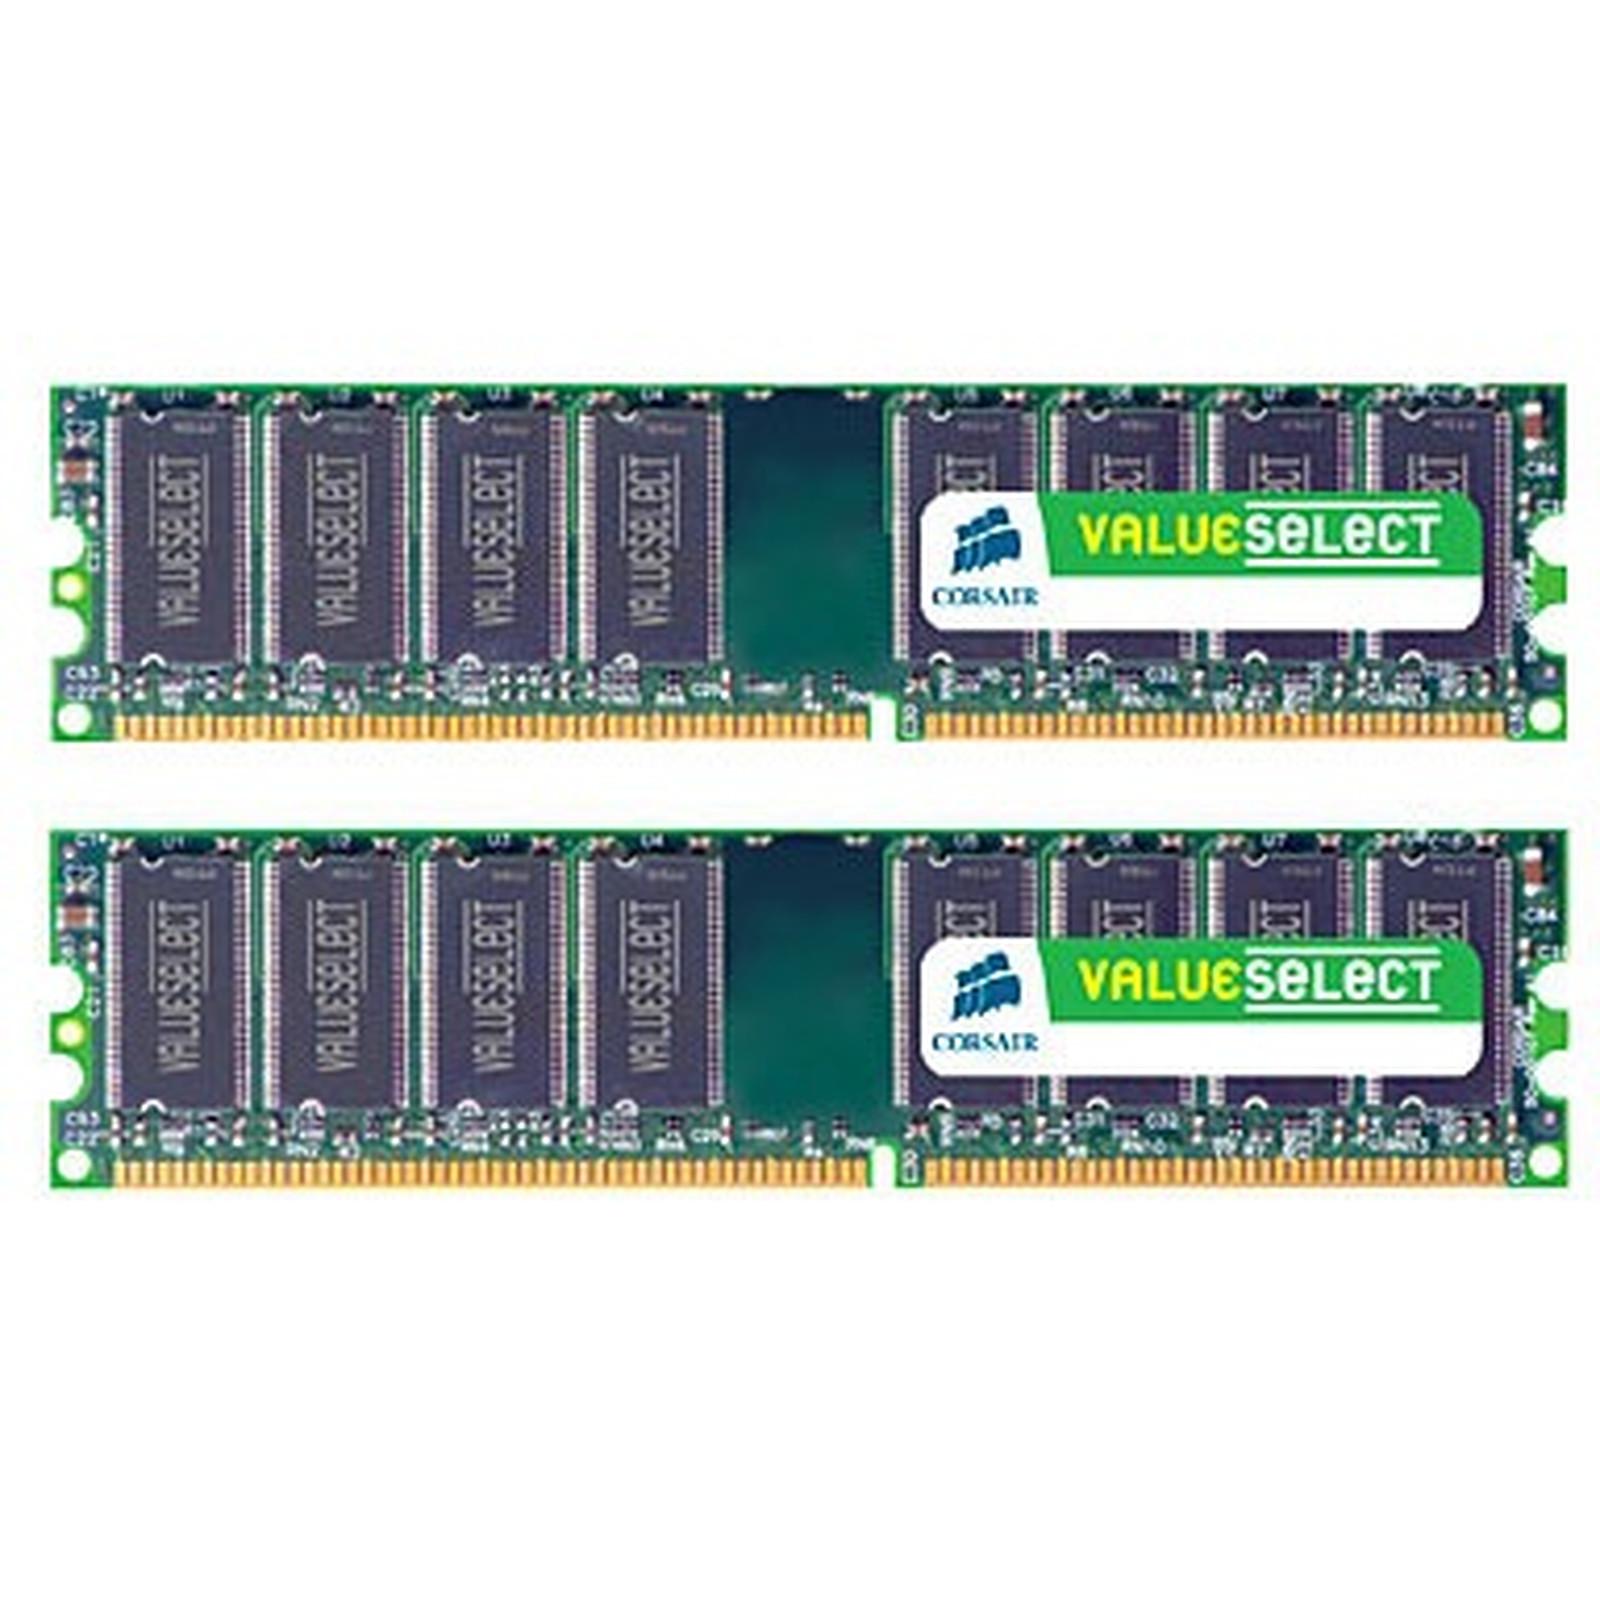 Corsair Value Select 4 Go (2x 2 Go) DDR2 667 MHz CL5